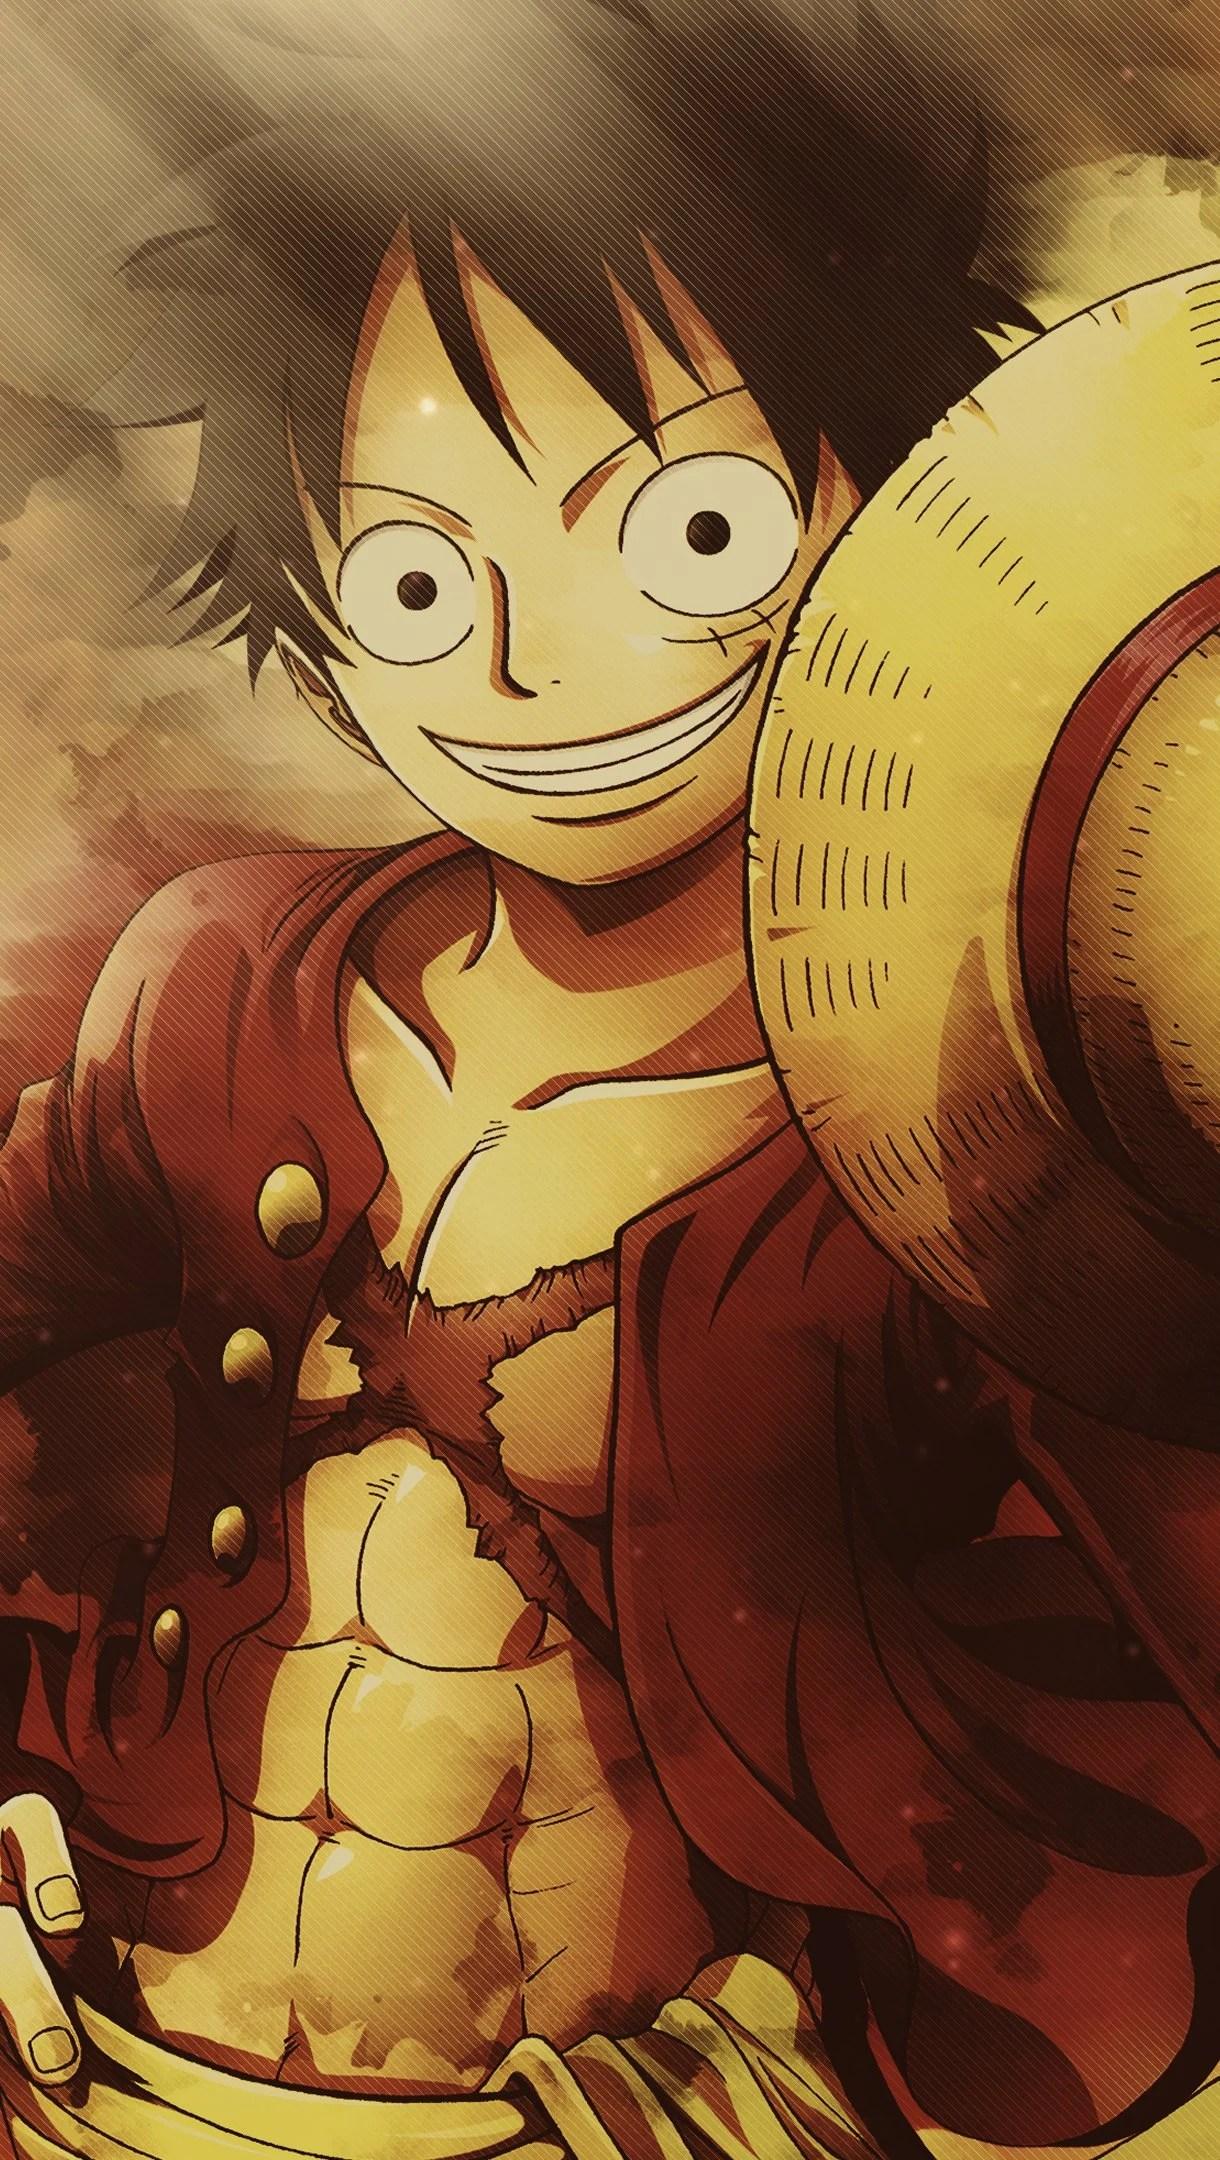 Ace (sunrise) hd wallpaper download Monkey D Luffy From One Piece Anime Wallpaper 4k Ultra Hd Id 4017